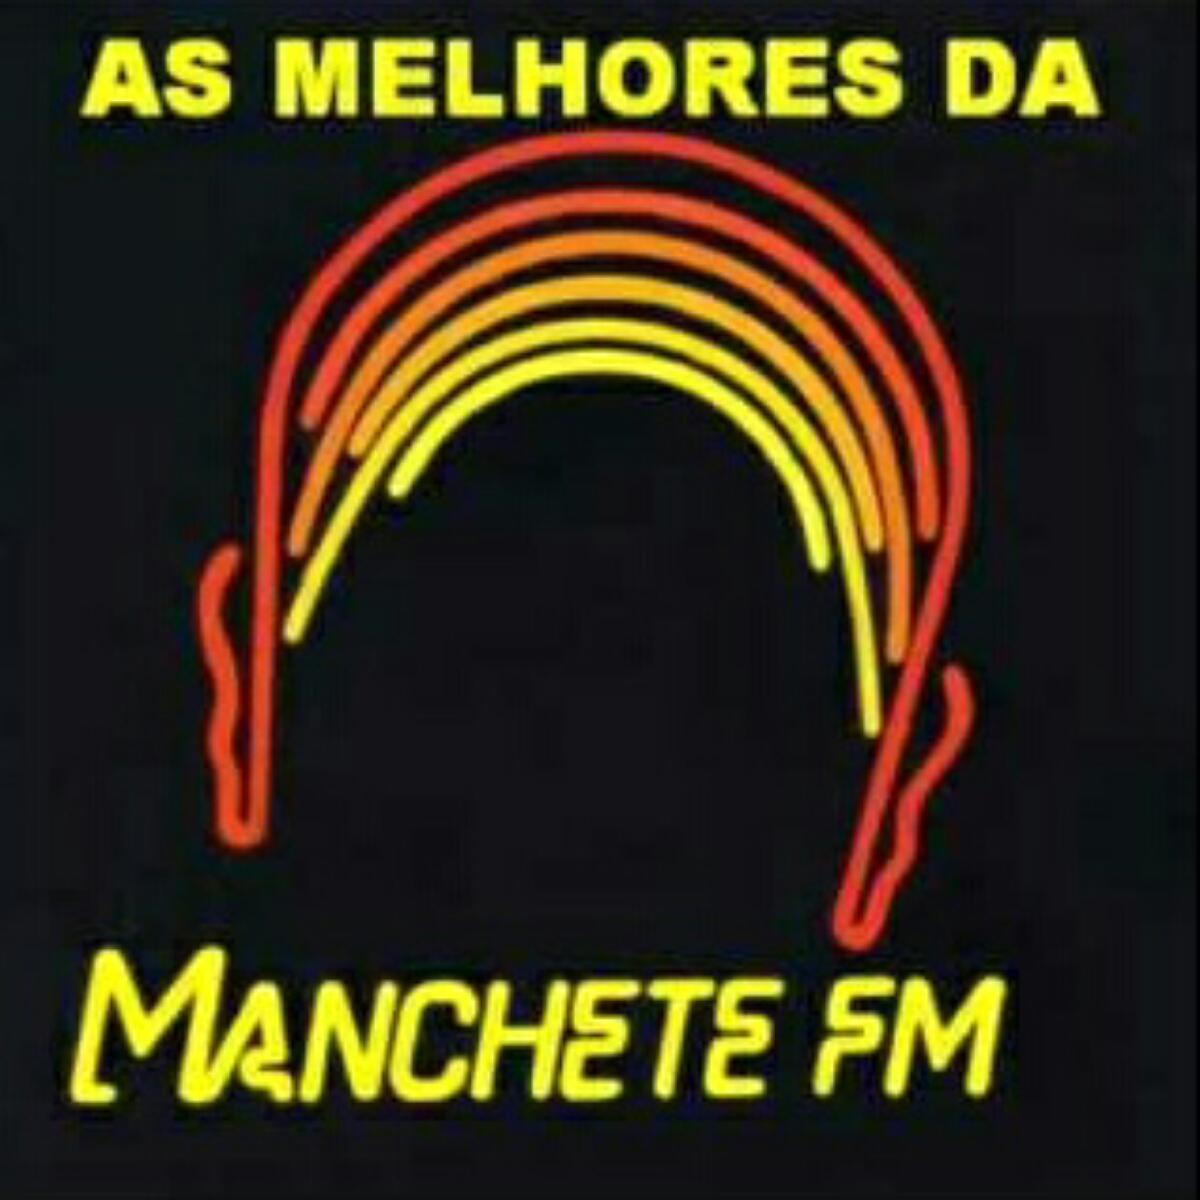 Manchete FM 91.3 MHz